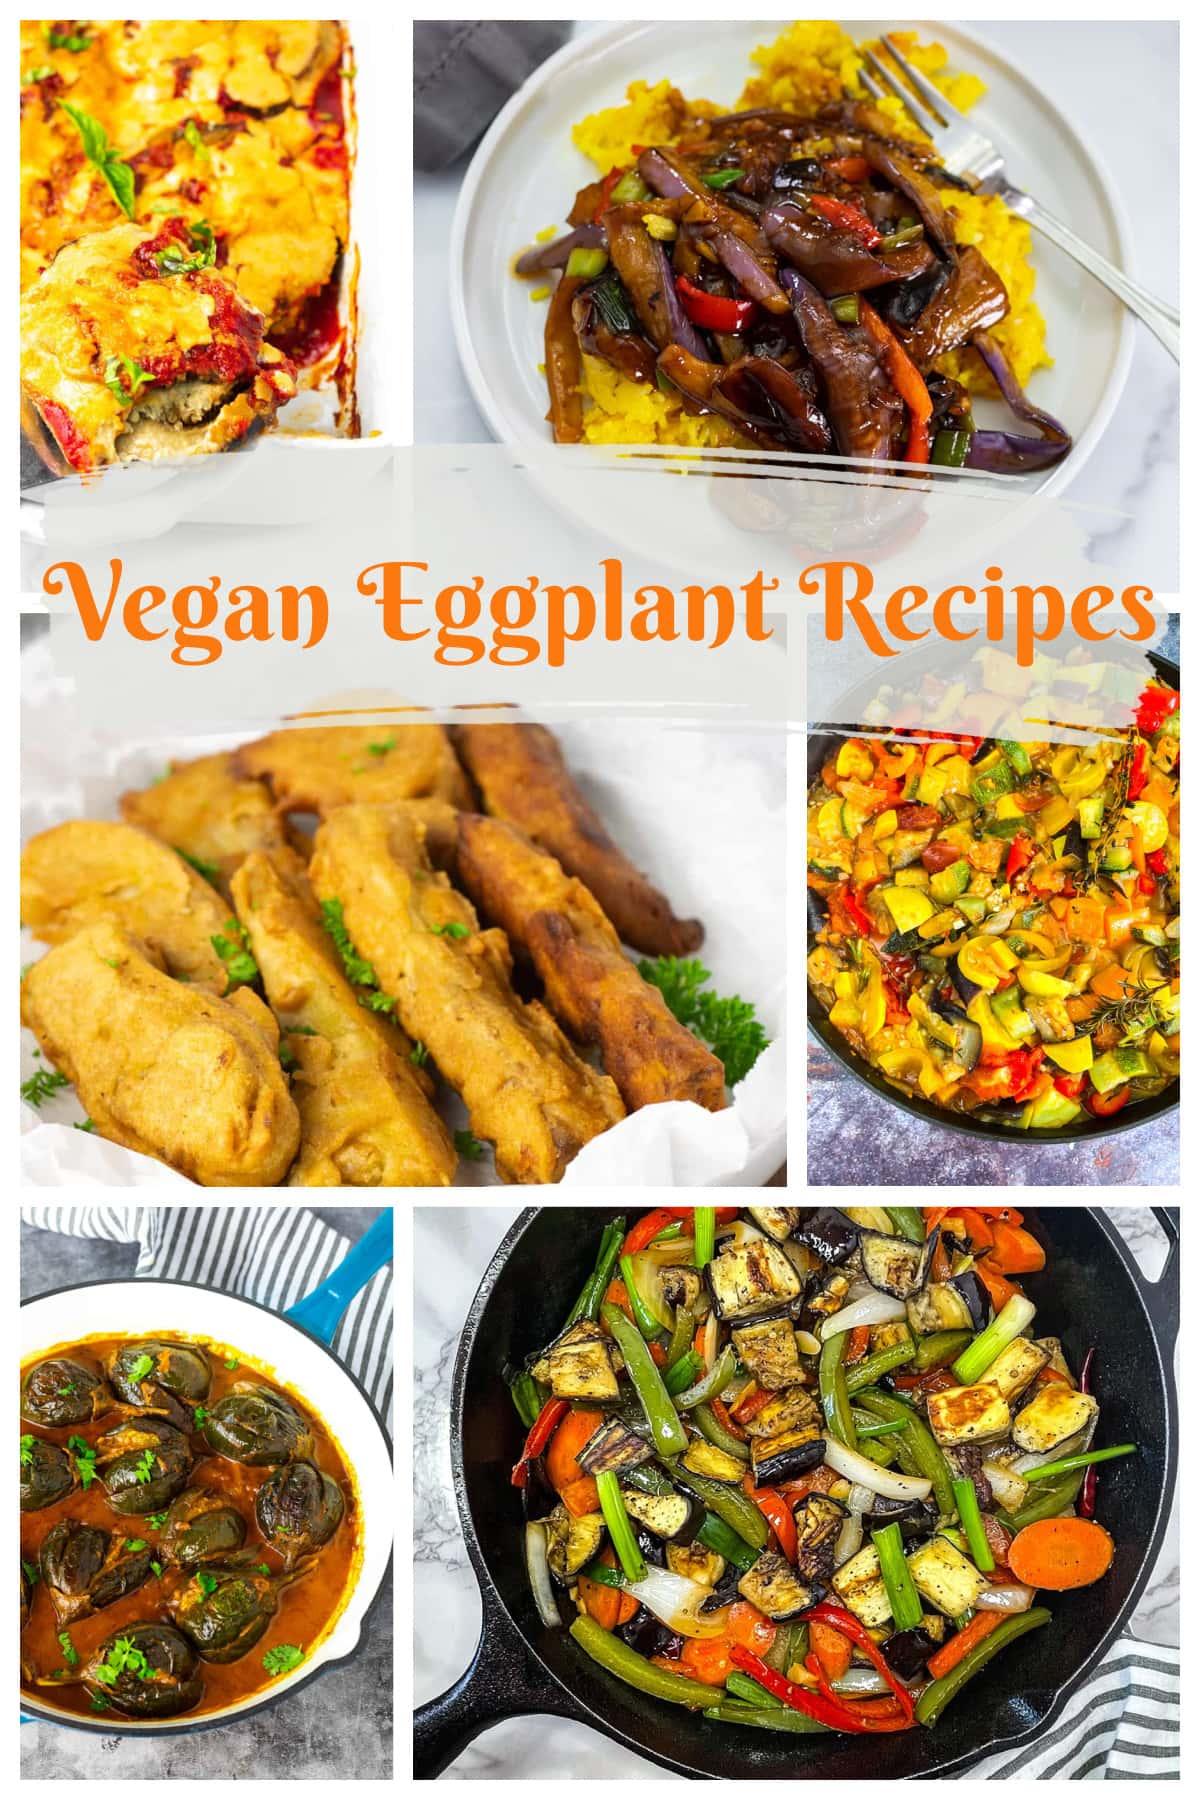 My Best Vegan Eggplant Recipes